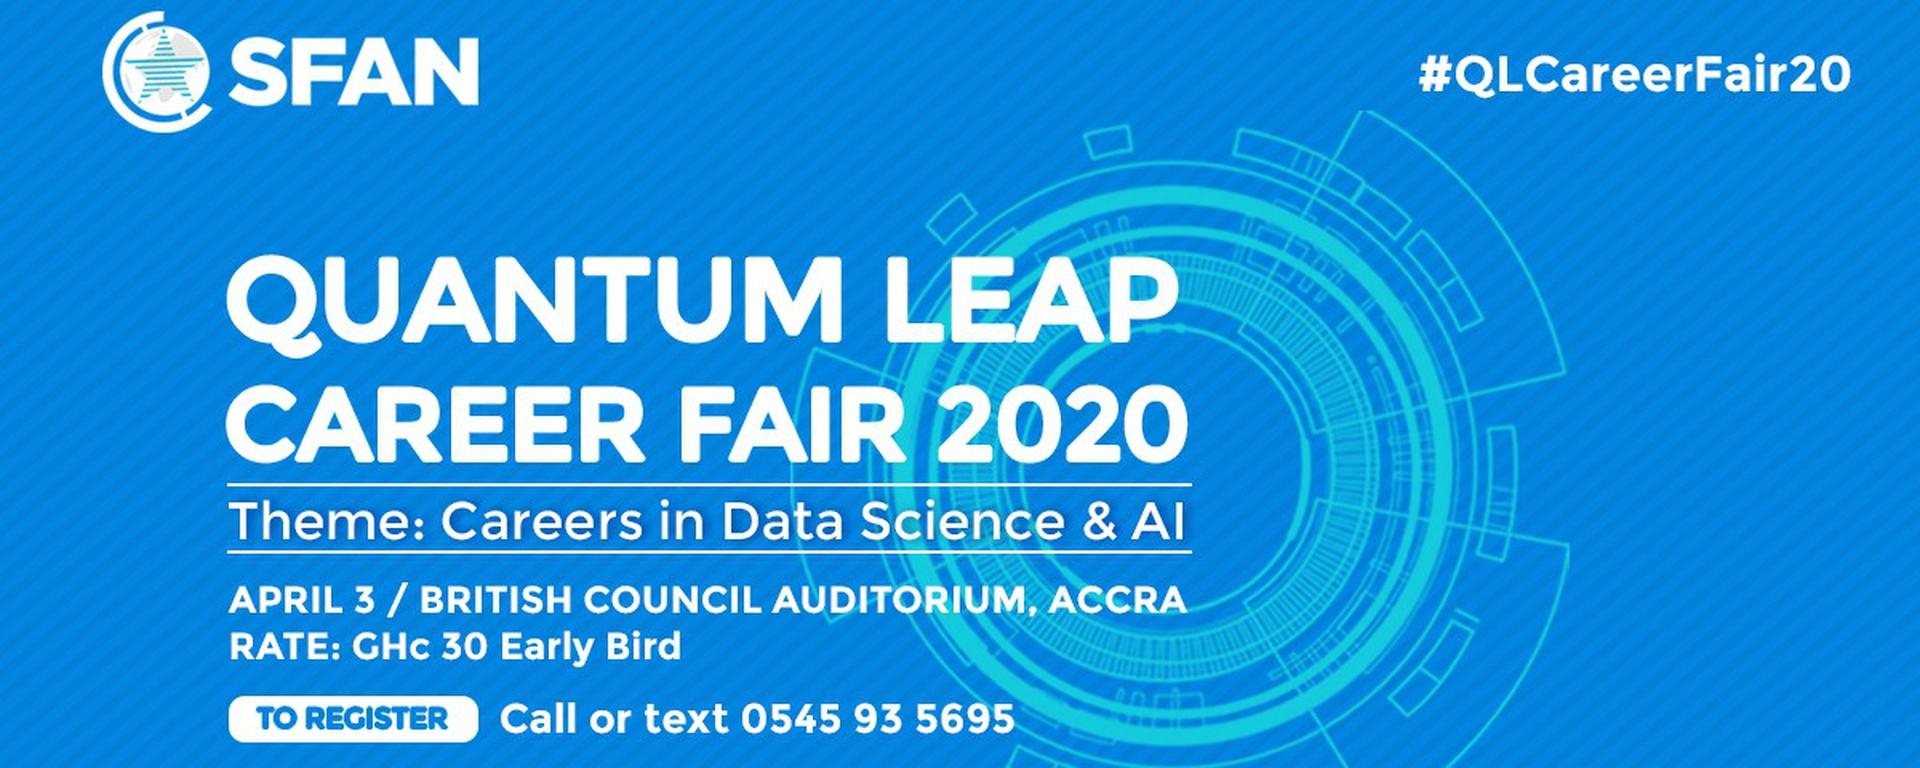 SFAN - Quantum Leap Career Fair 2020 - Careers in Data Science & AI Movemeback African event cover image